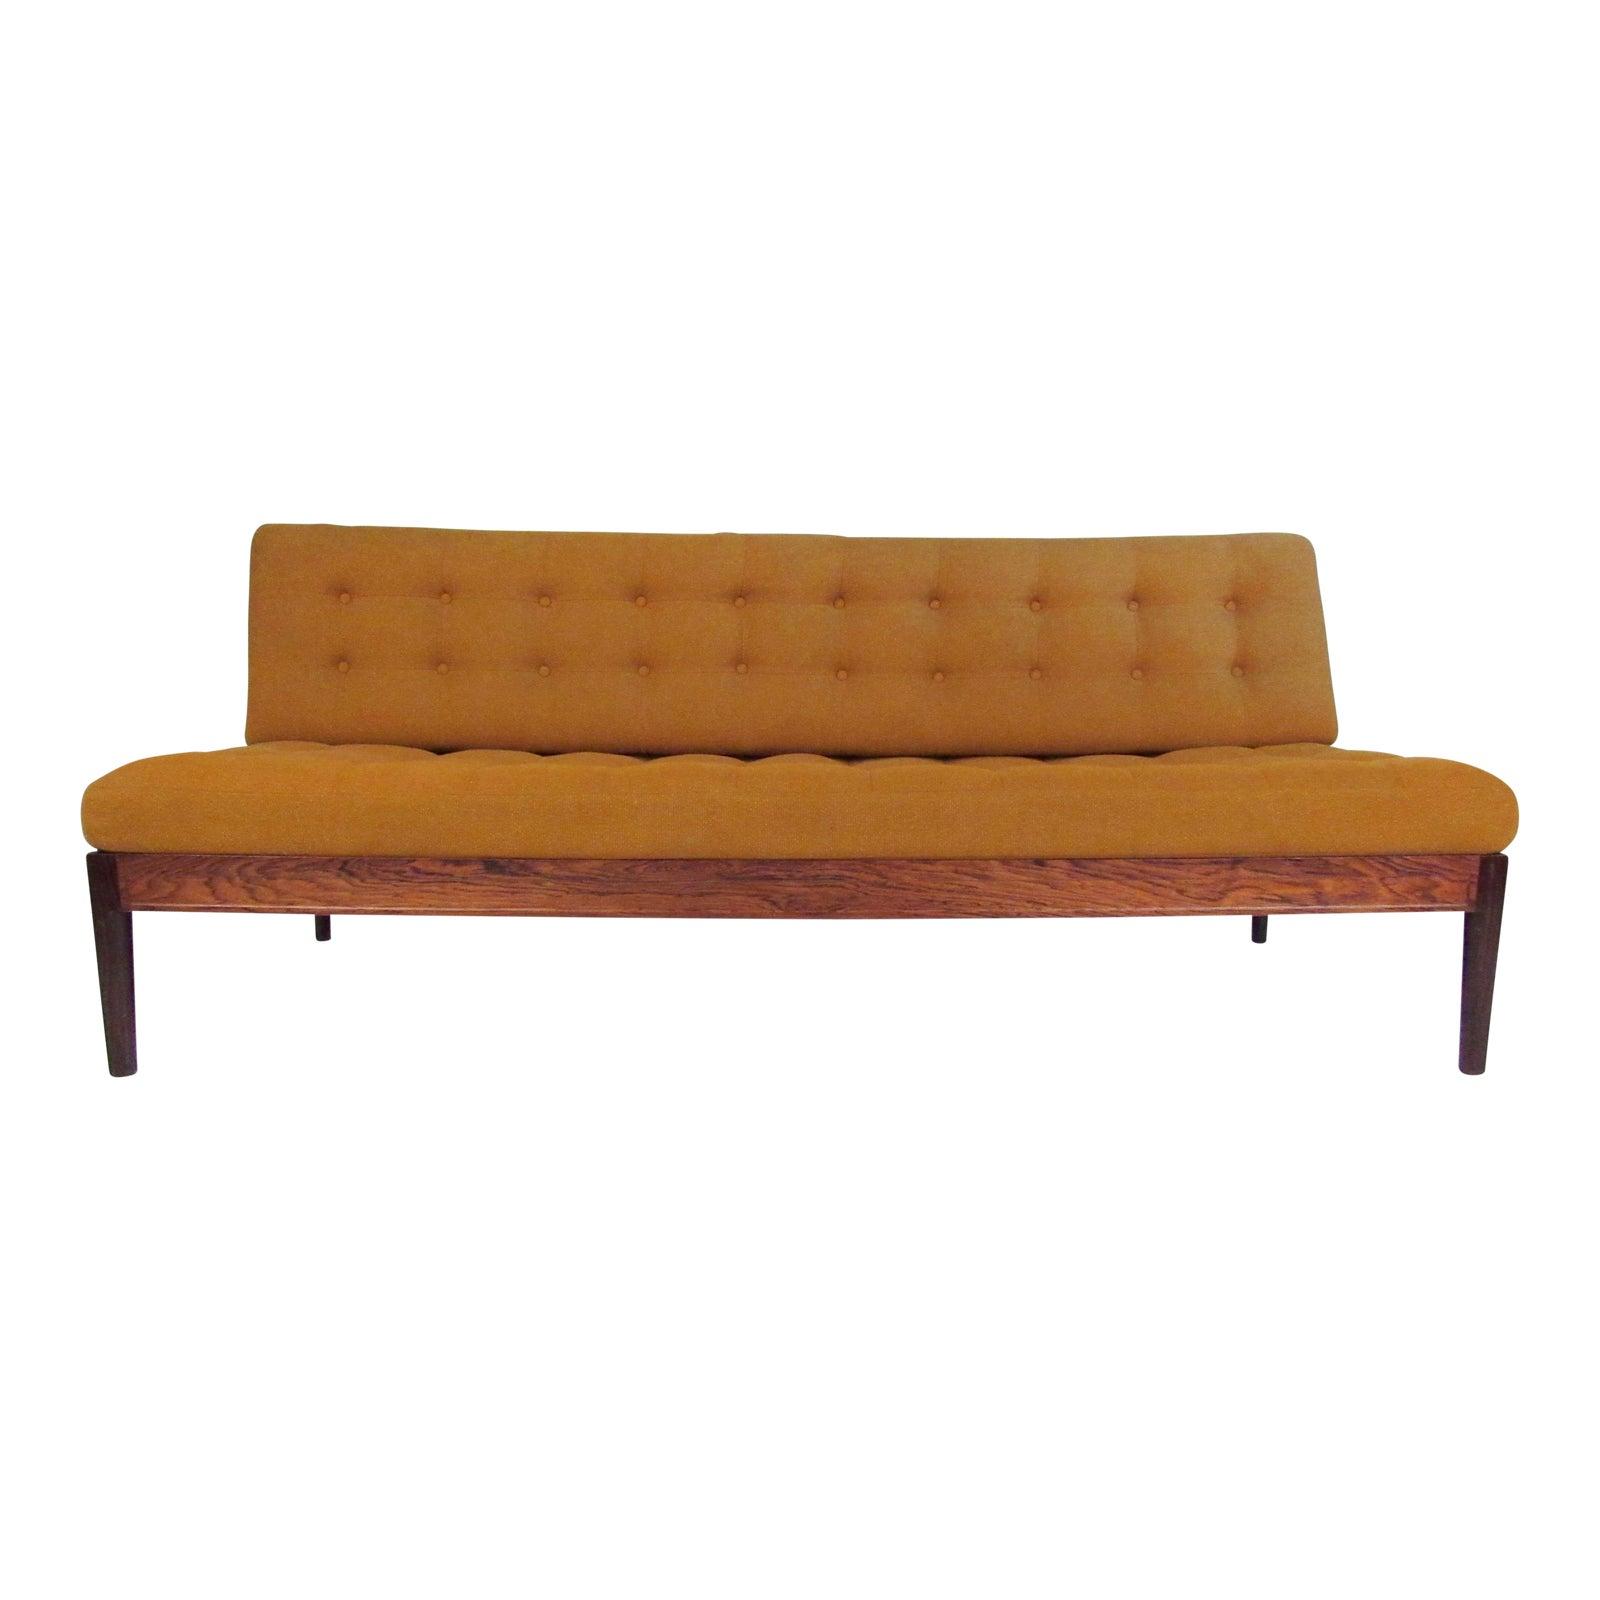 Scandinavian Modern Tufted Sofa by Finn Juhl